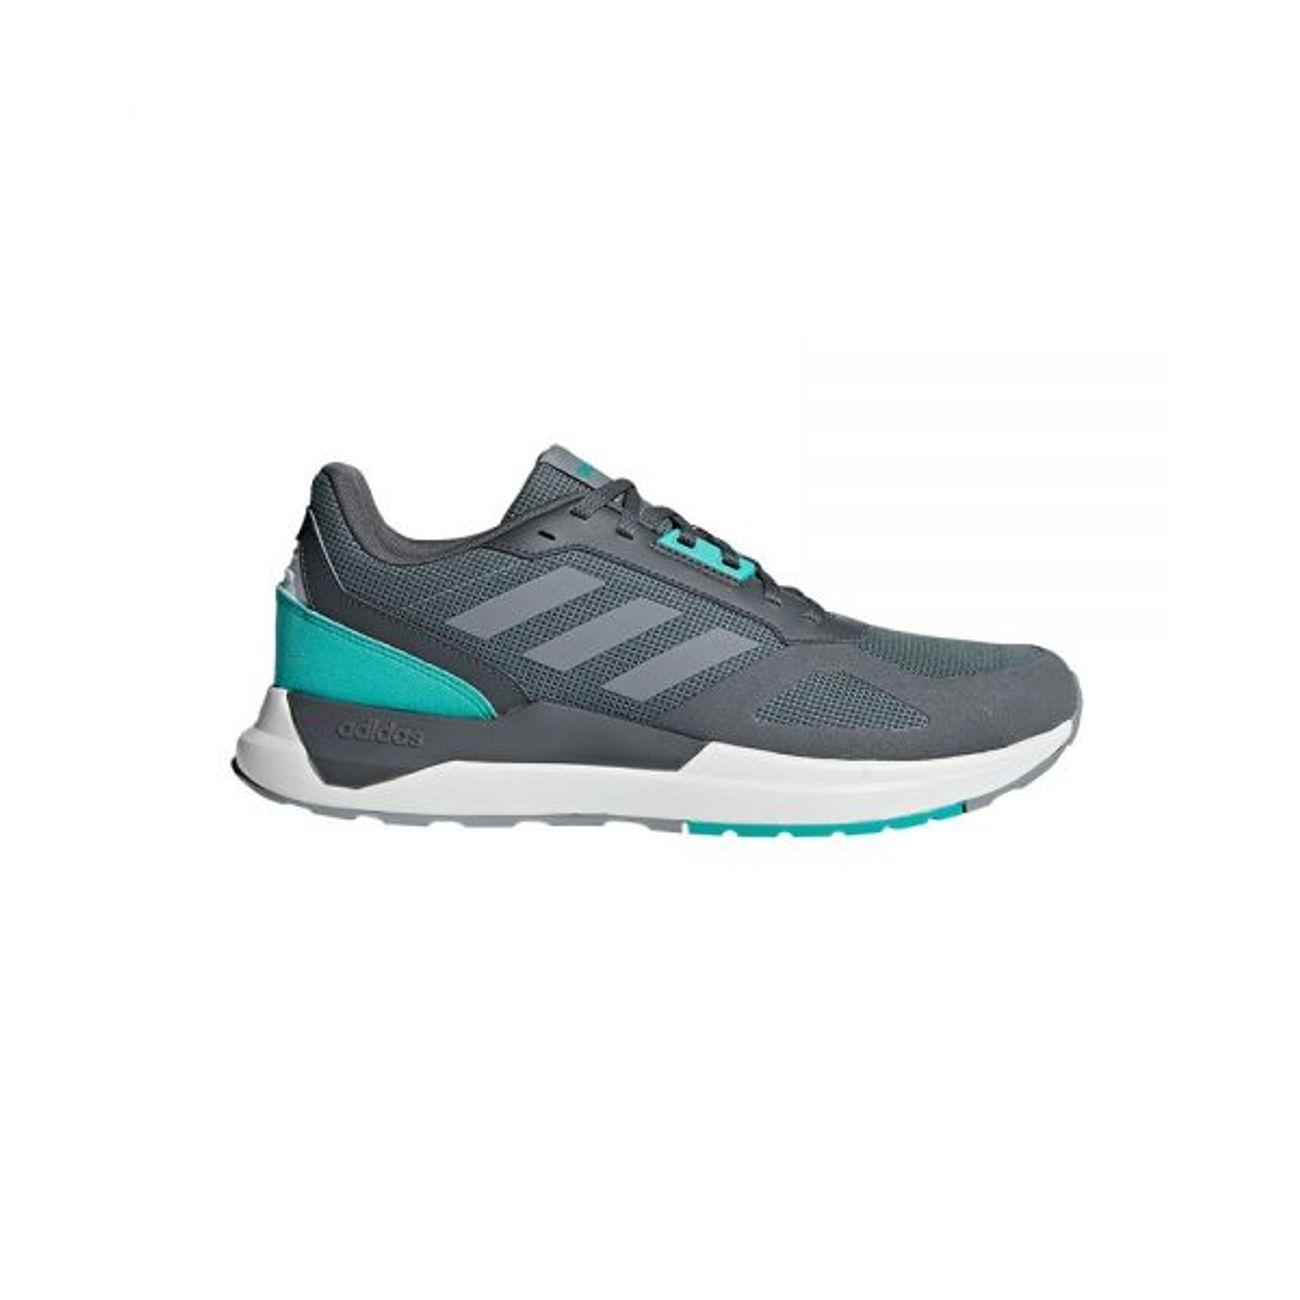 Running Run80s Bb7829 Adulte Adidas Gris 5Rjc3L4qA